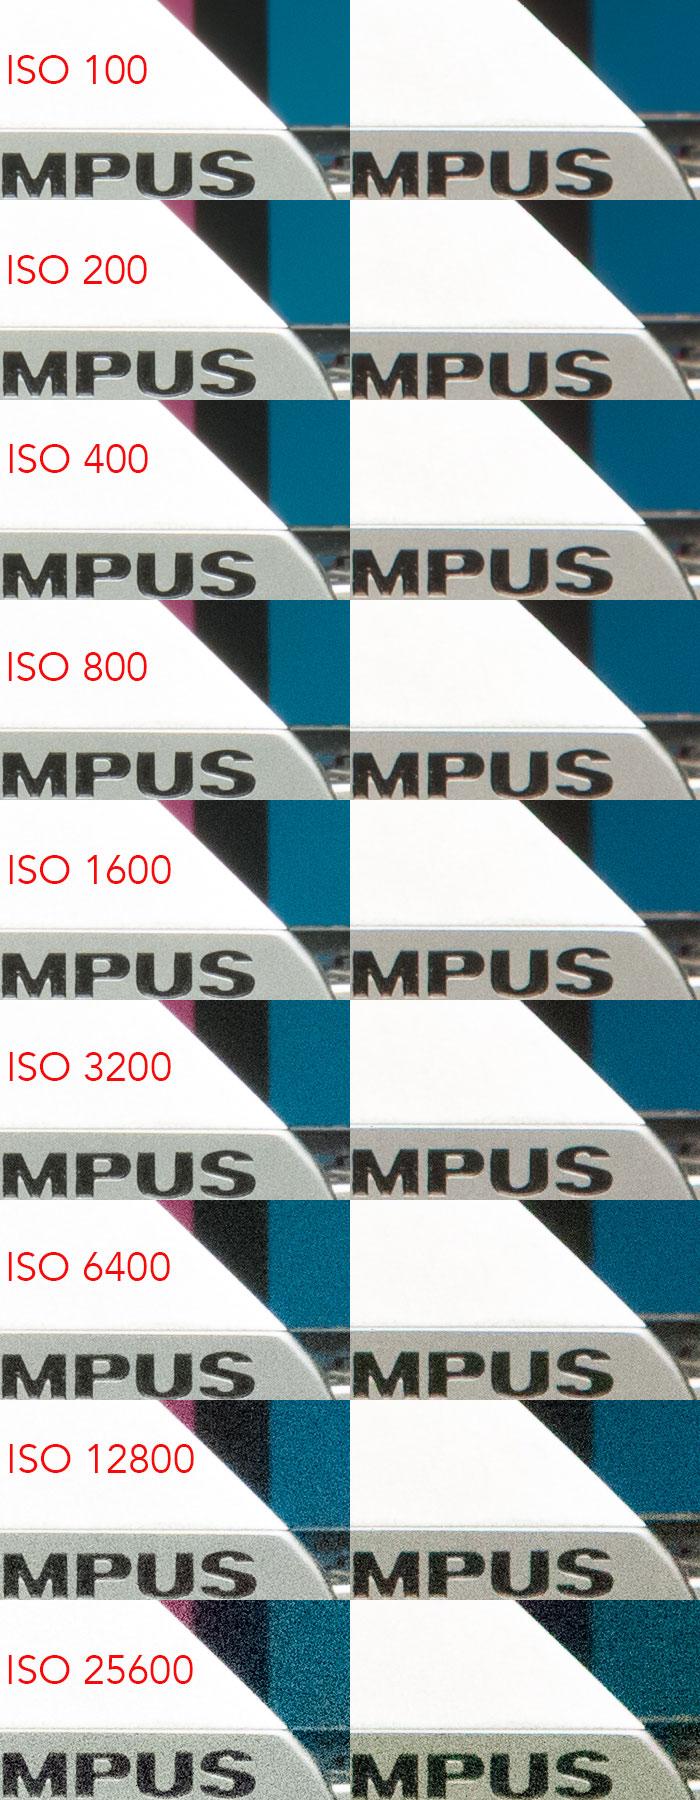 Nikon-D5500-ISO-Comparison